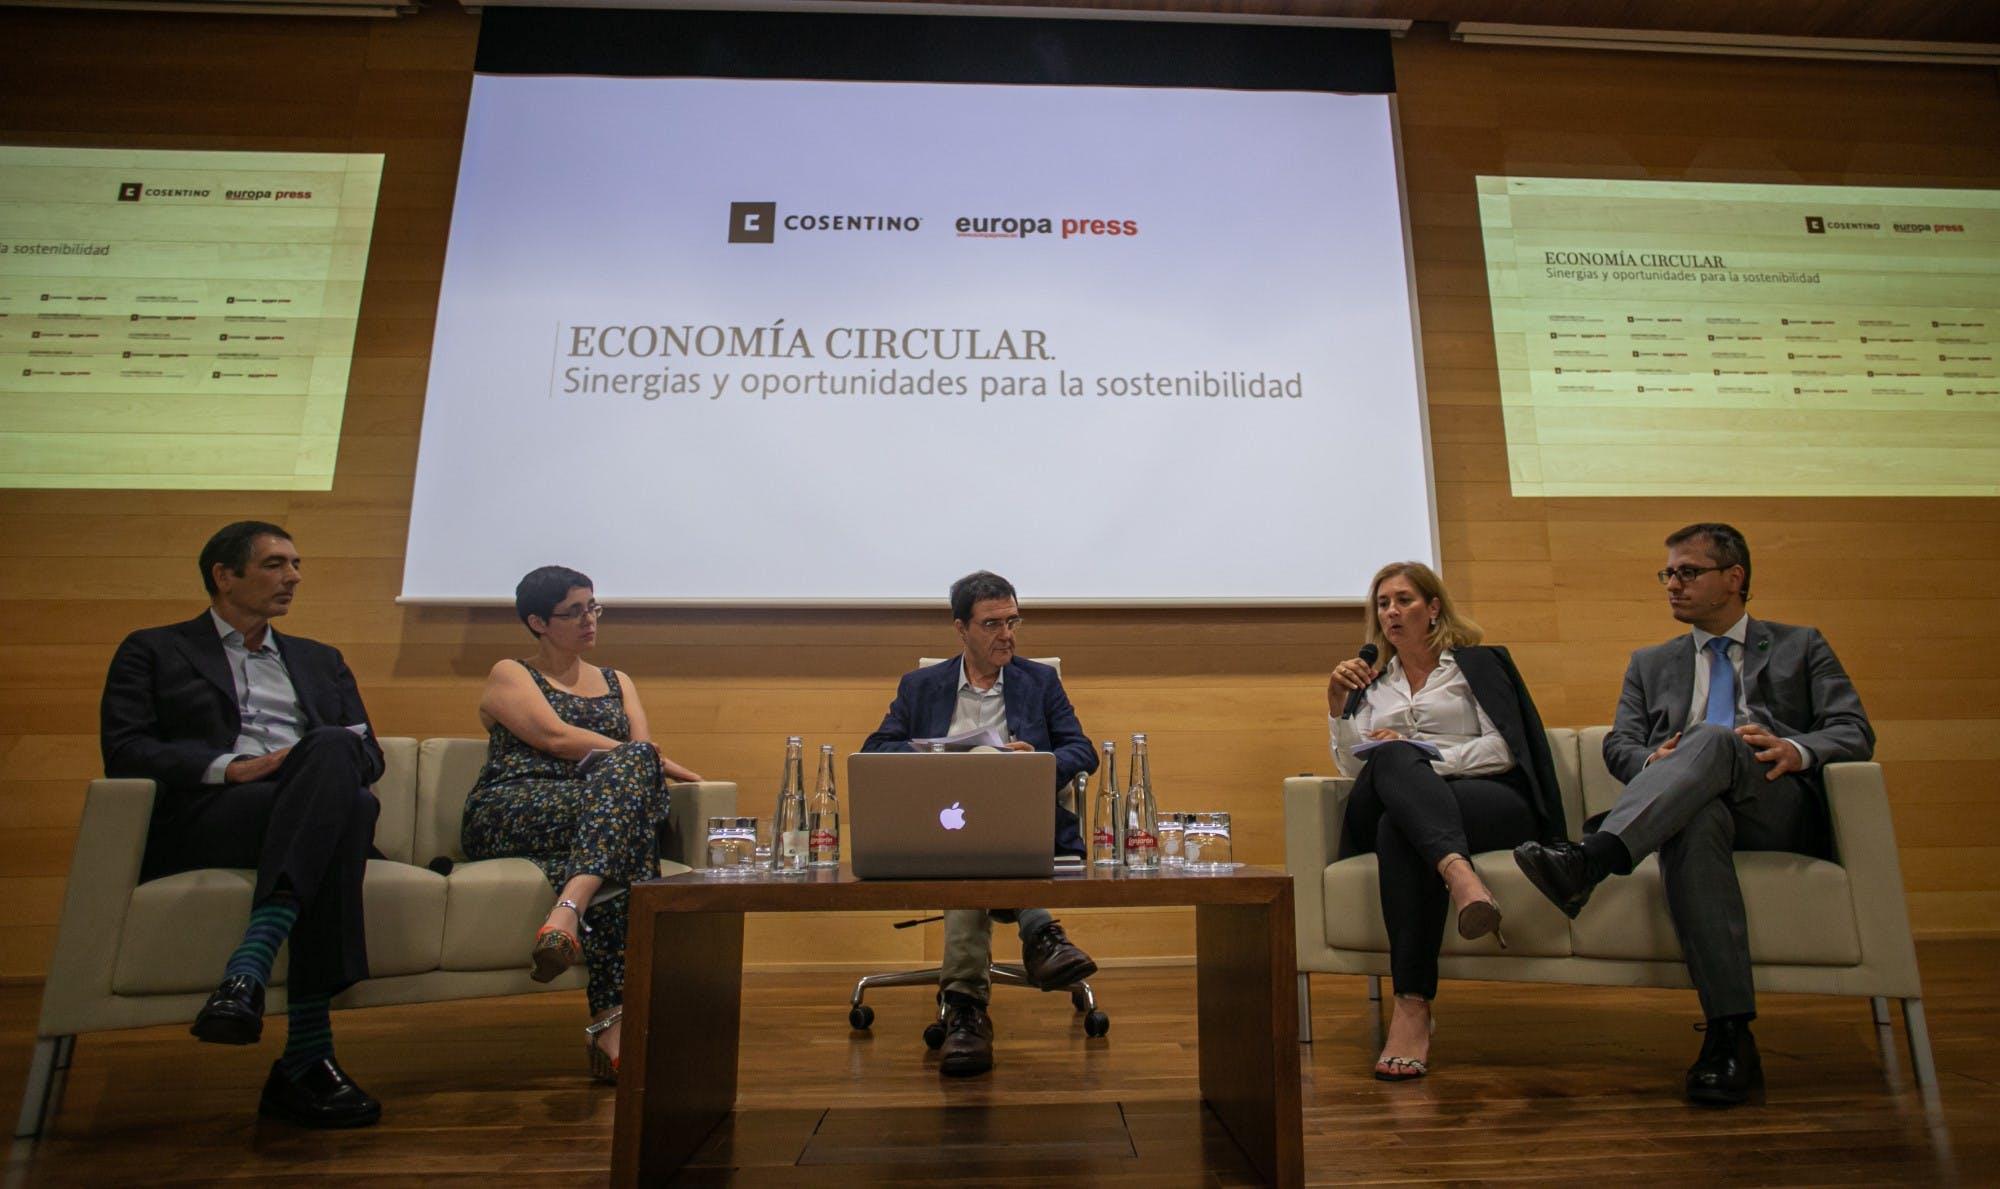 Image of Mesa Redonda Jornada Economia Circular Cosentino 2 in Cosentino promotes the Circular Economy and Industrial Simbiosis - Cosentino